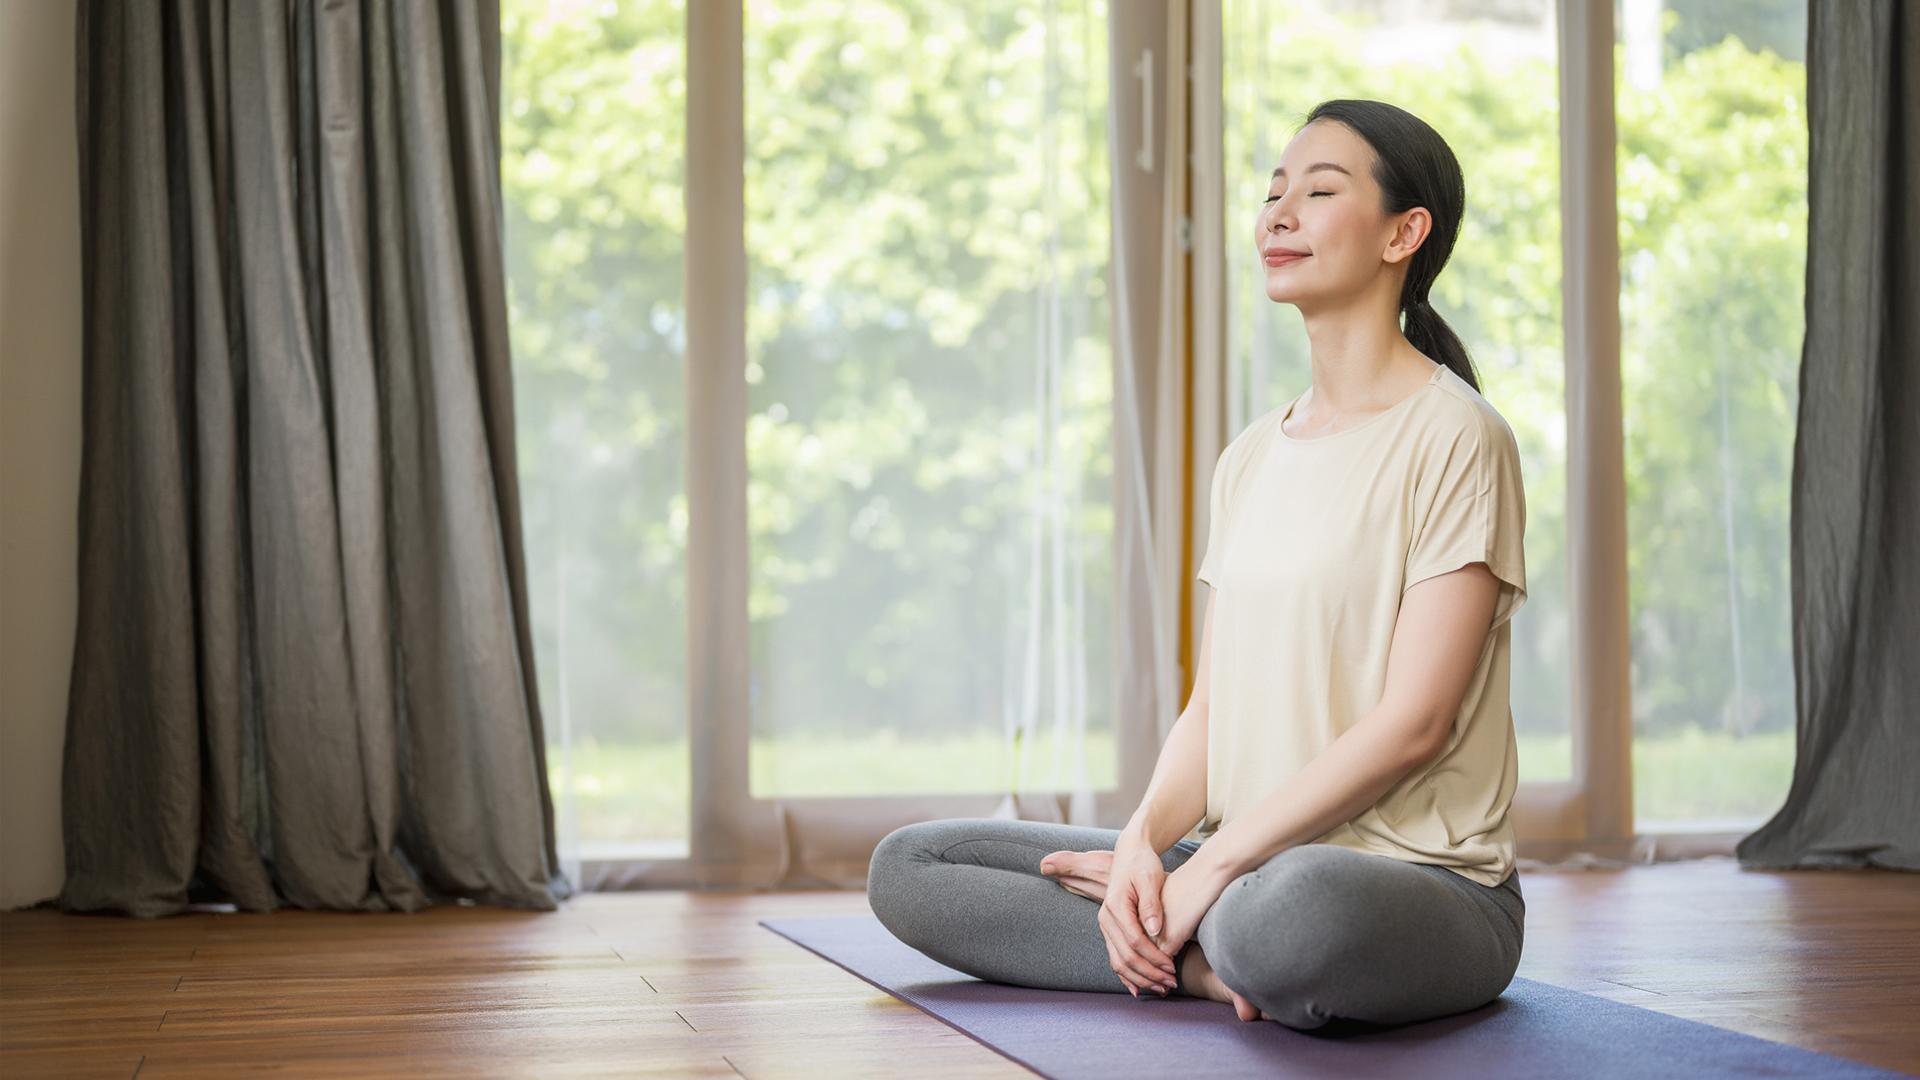 7 types of yoga: image shows woman doing yoga breathing exercises